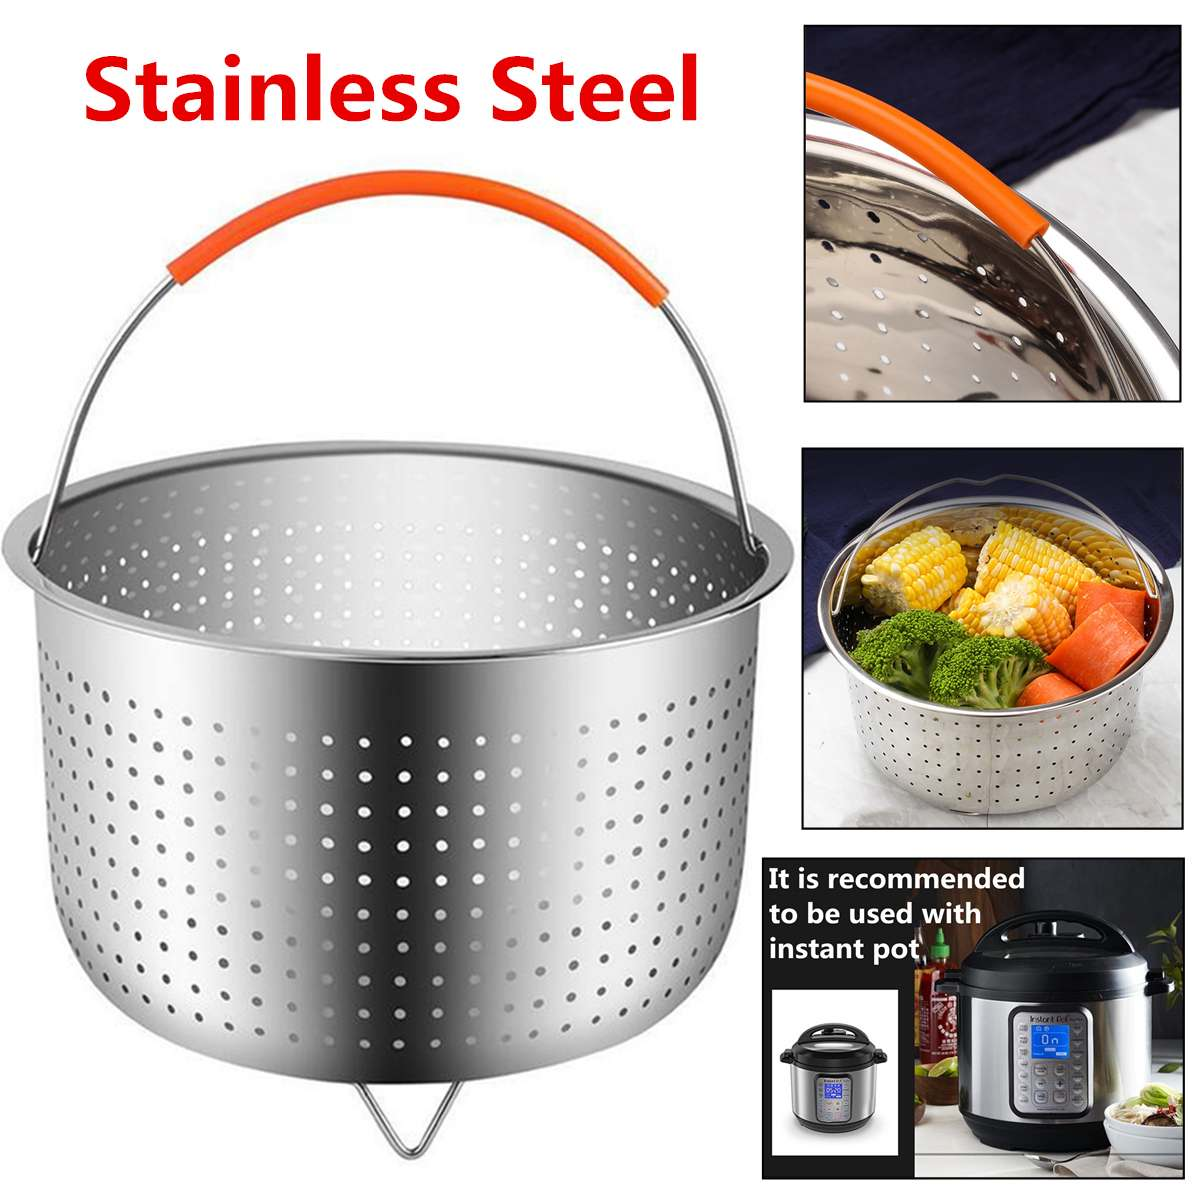 Stainless Steel Steamer Rice Cooker Fruits Steamer With Silicone Handle Kitchen Colander Steamer Instant Pot Steam Basket